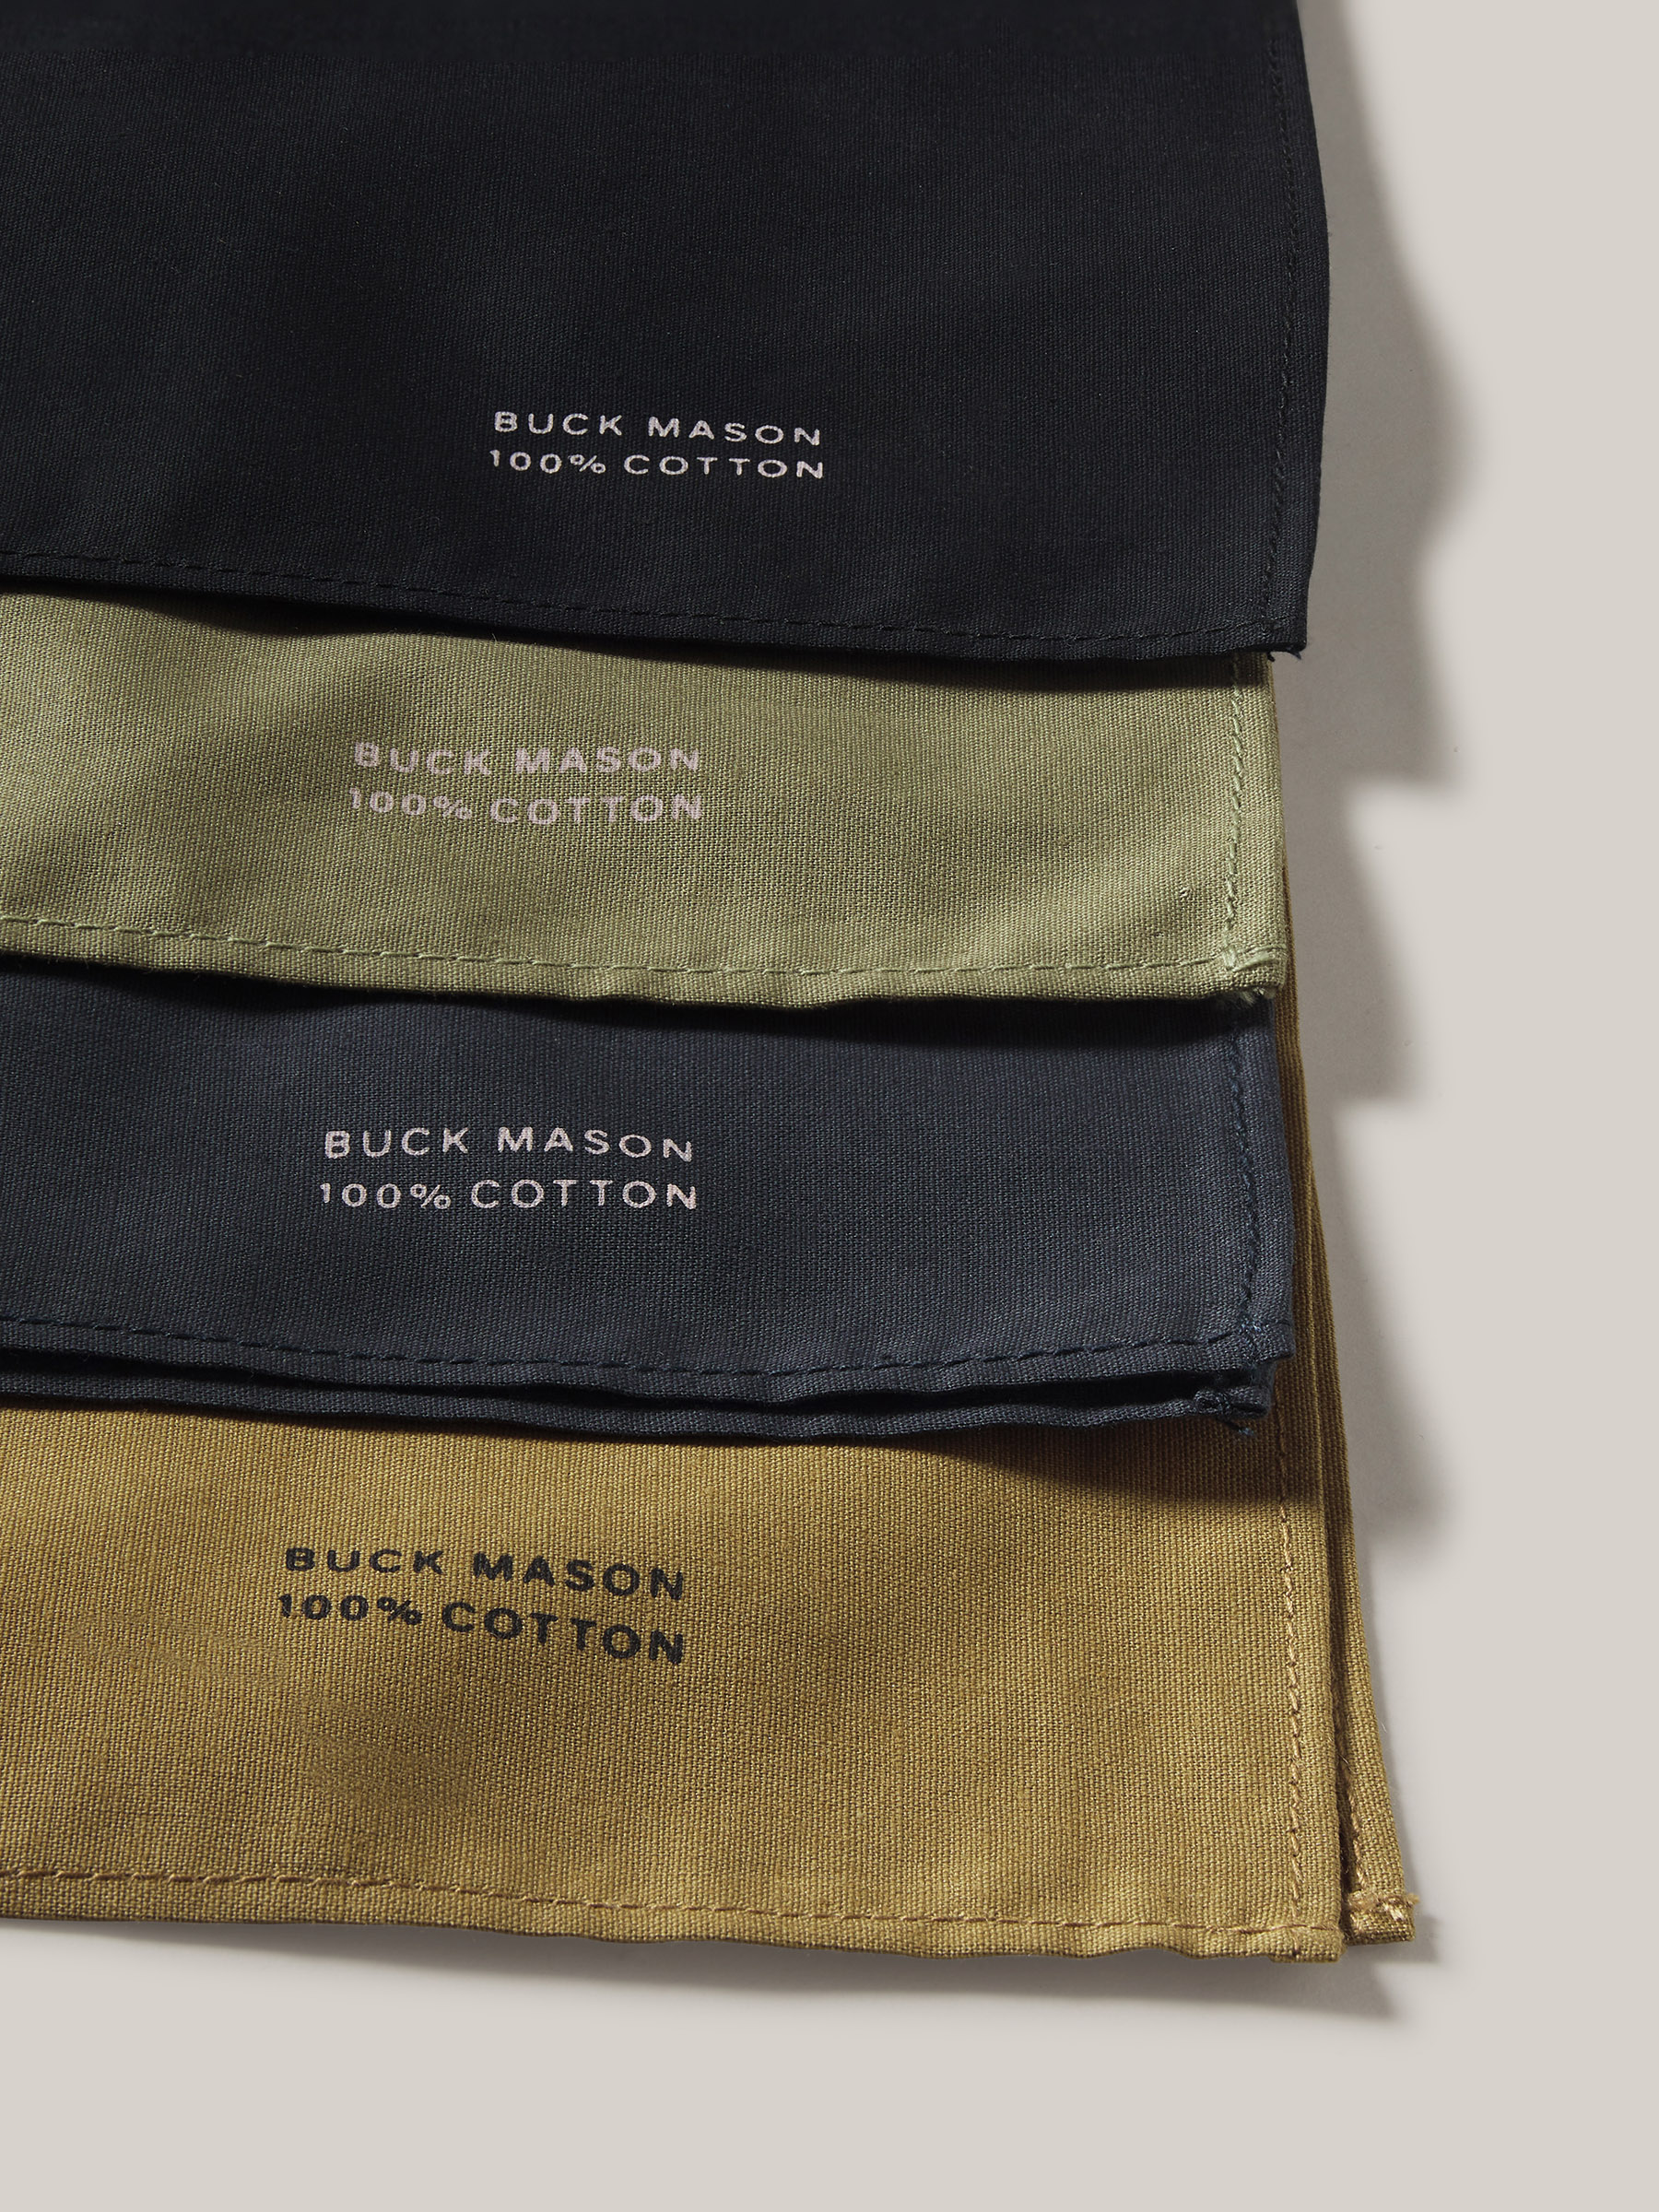 Buck Mason - Coal Built Tough Bandana 2-Pack